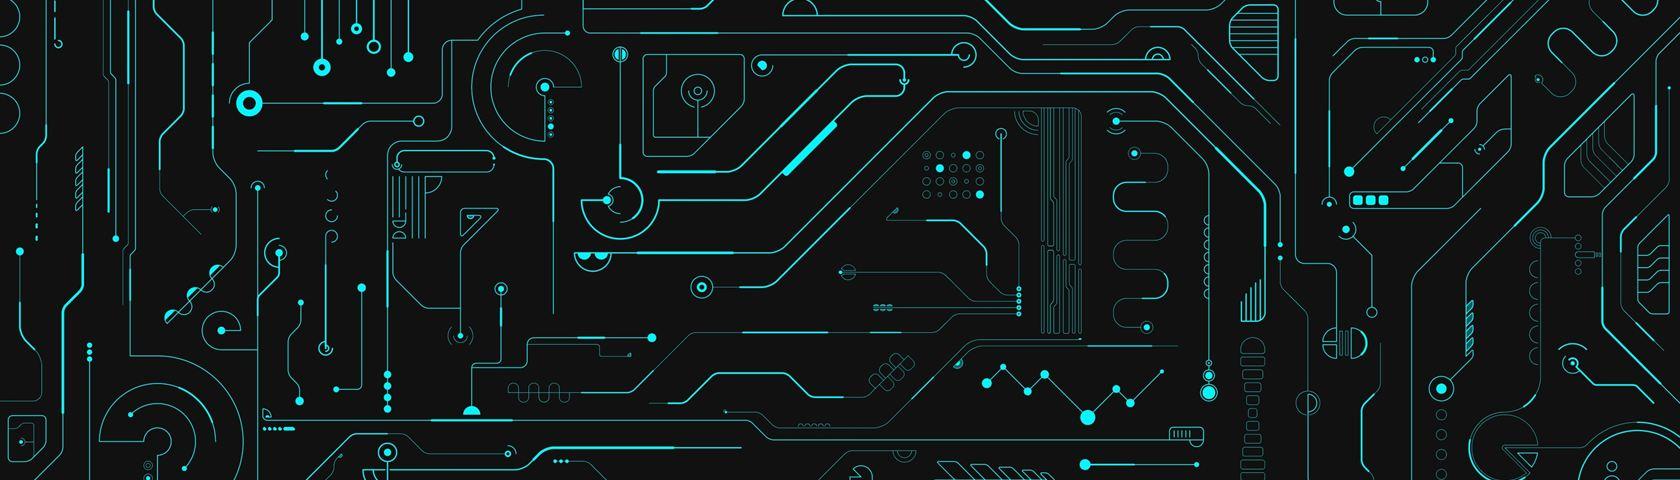 Minimalistic Computer-esque Pattern